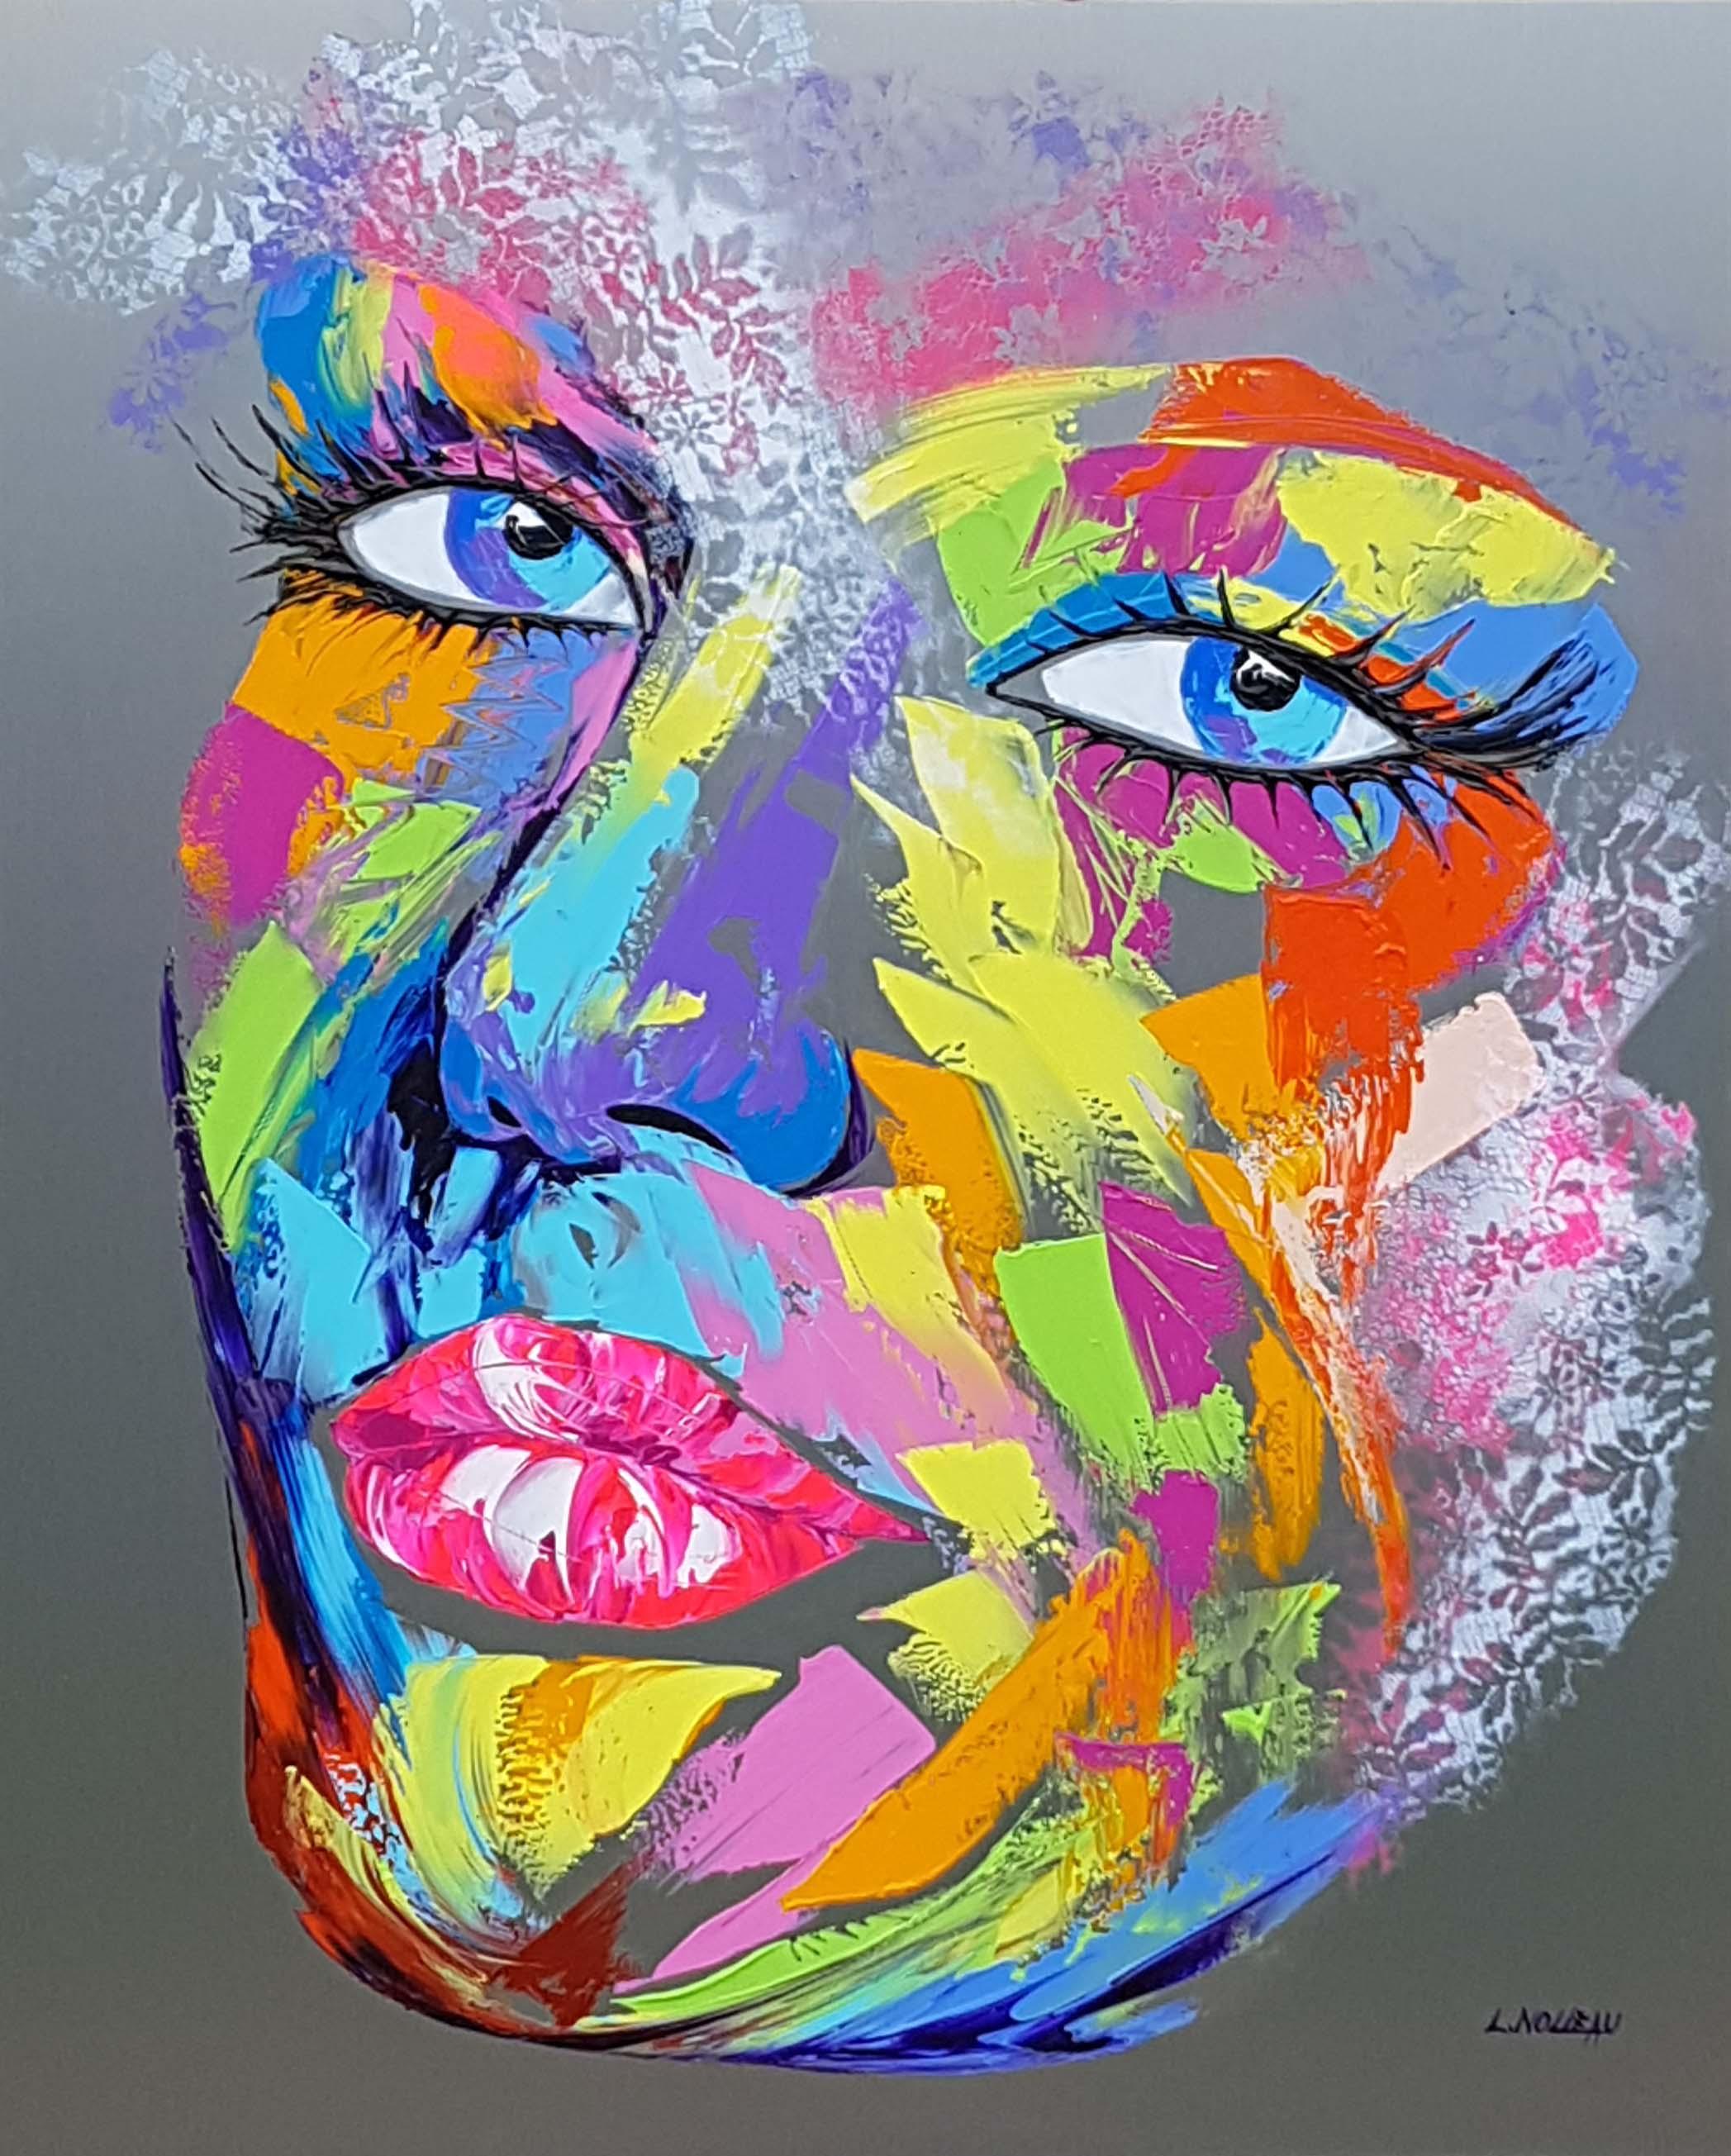 https://www.galerie-saint-martin.com/artistes/nolleau/